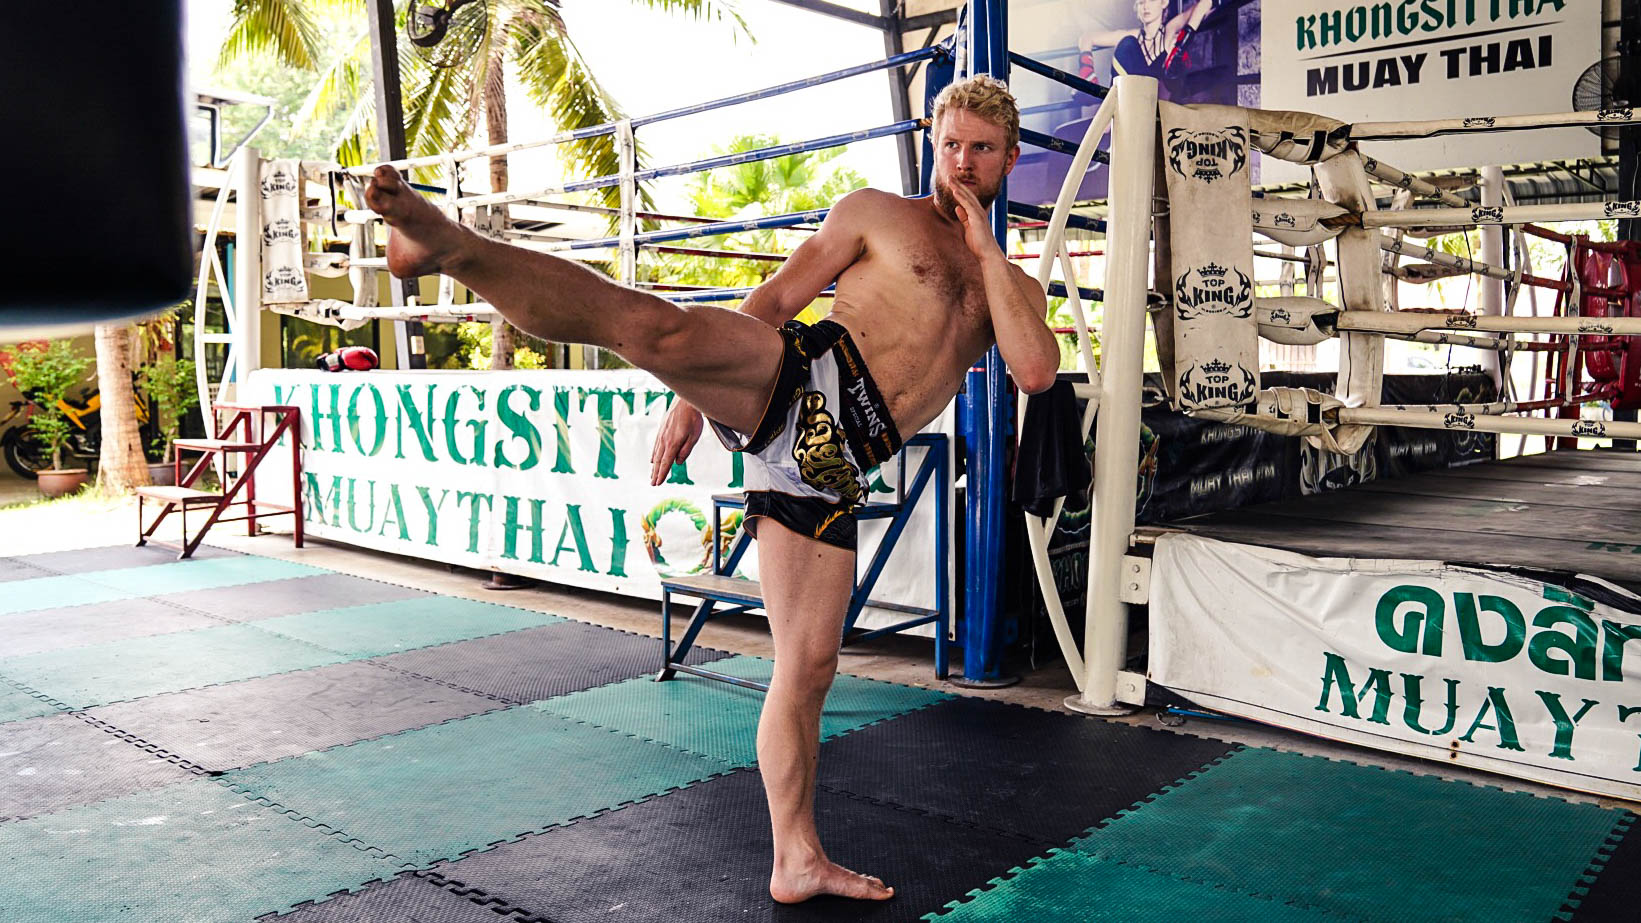 kick mobility thaiboxing muay thai